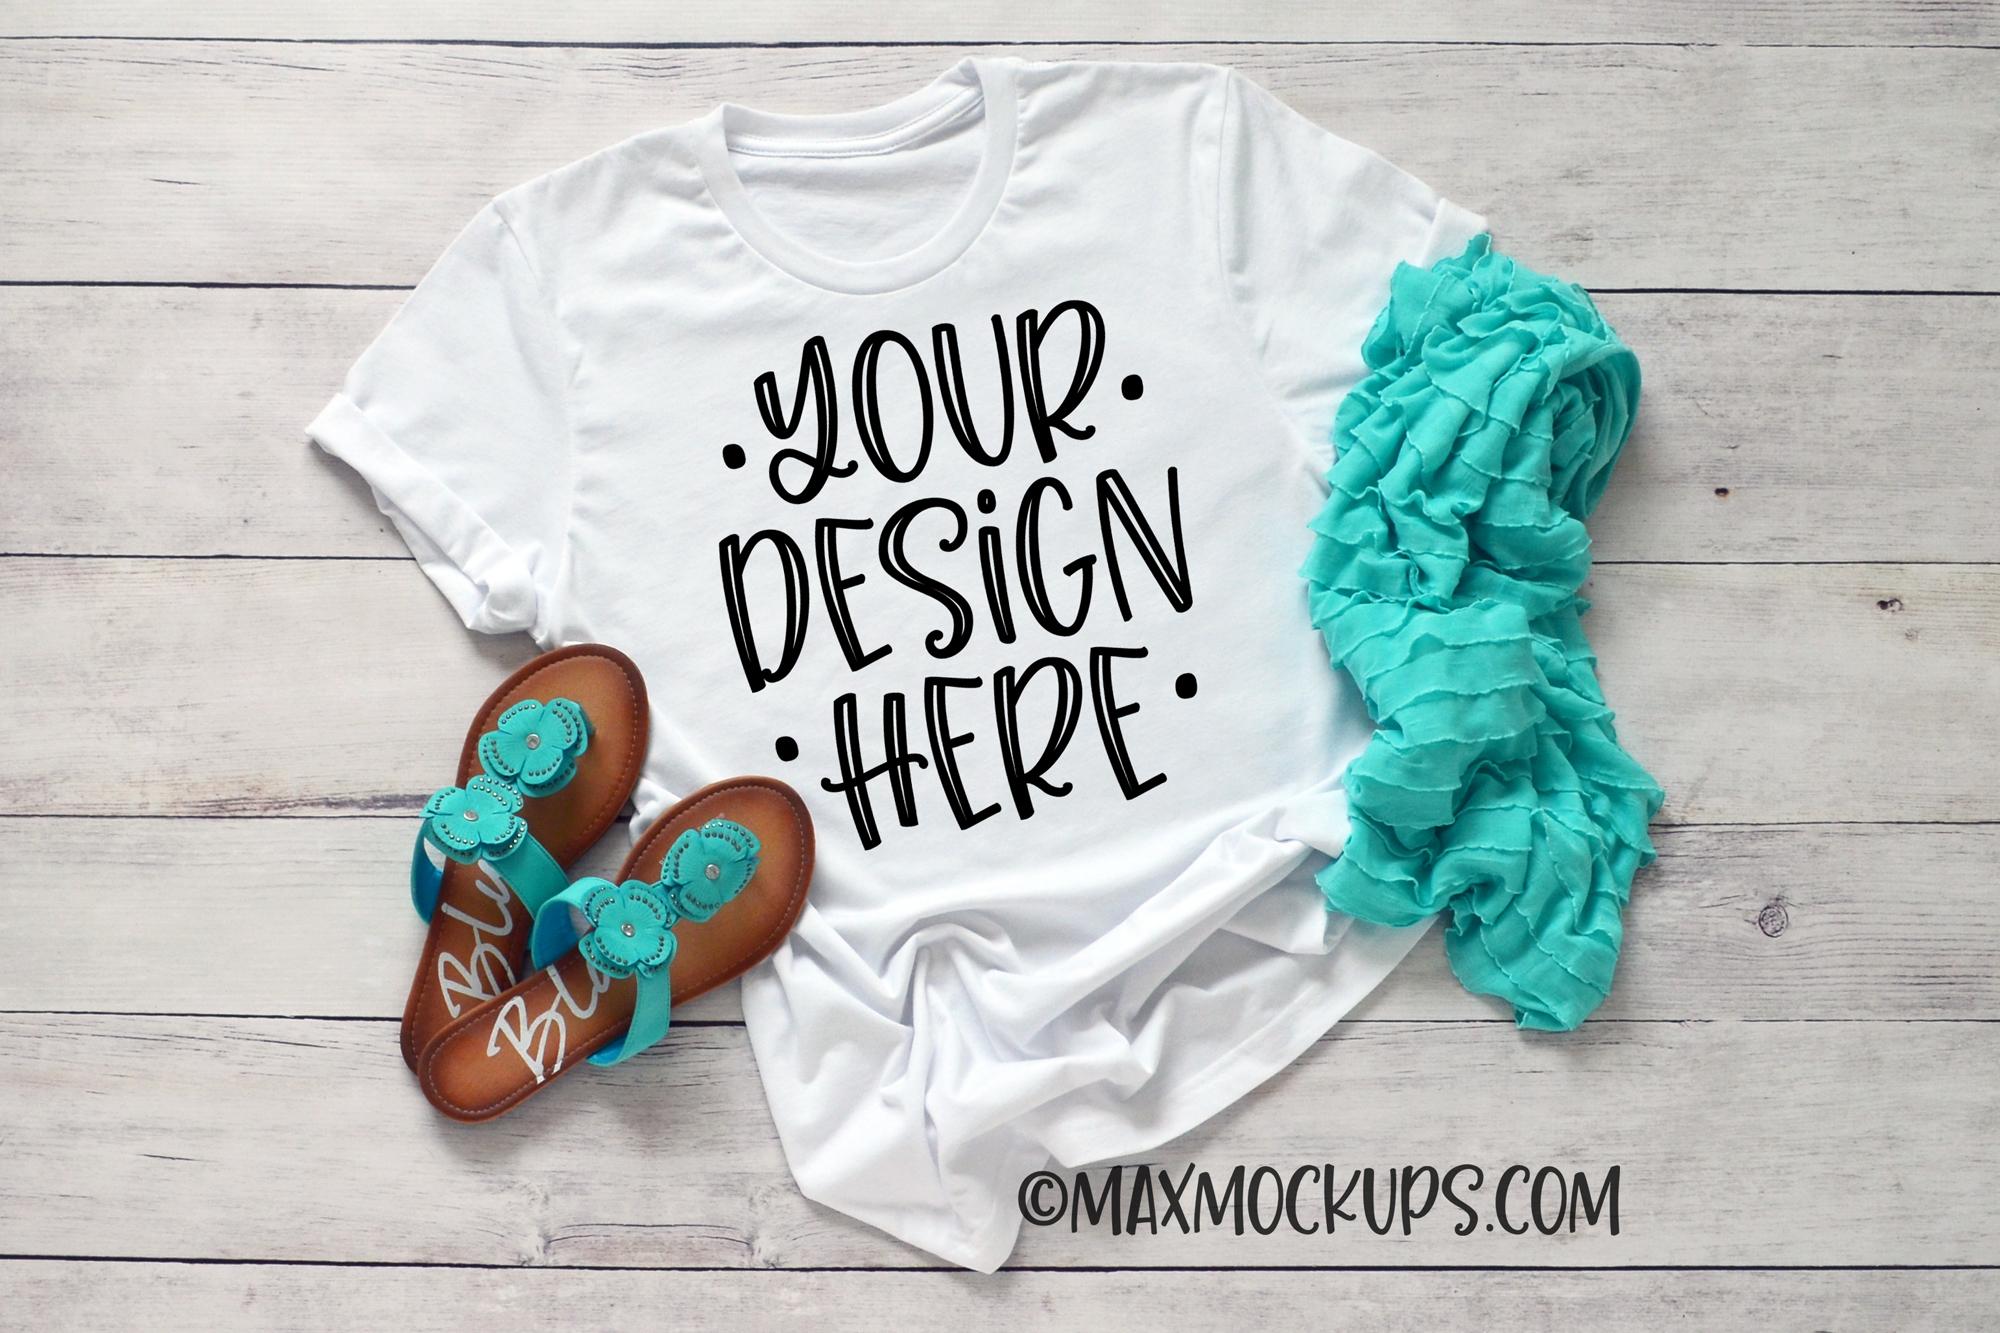 White t-shirt mockup Bella Canvas 3001, summer sandals example image 1